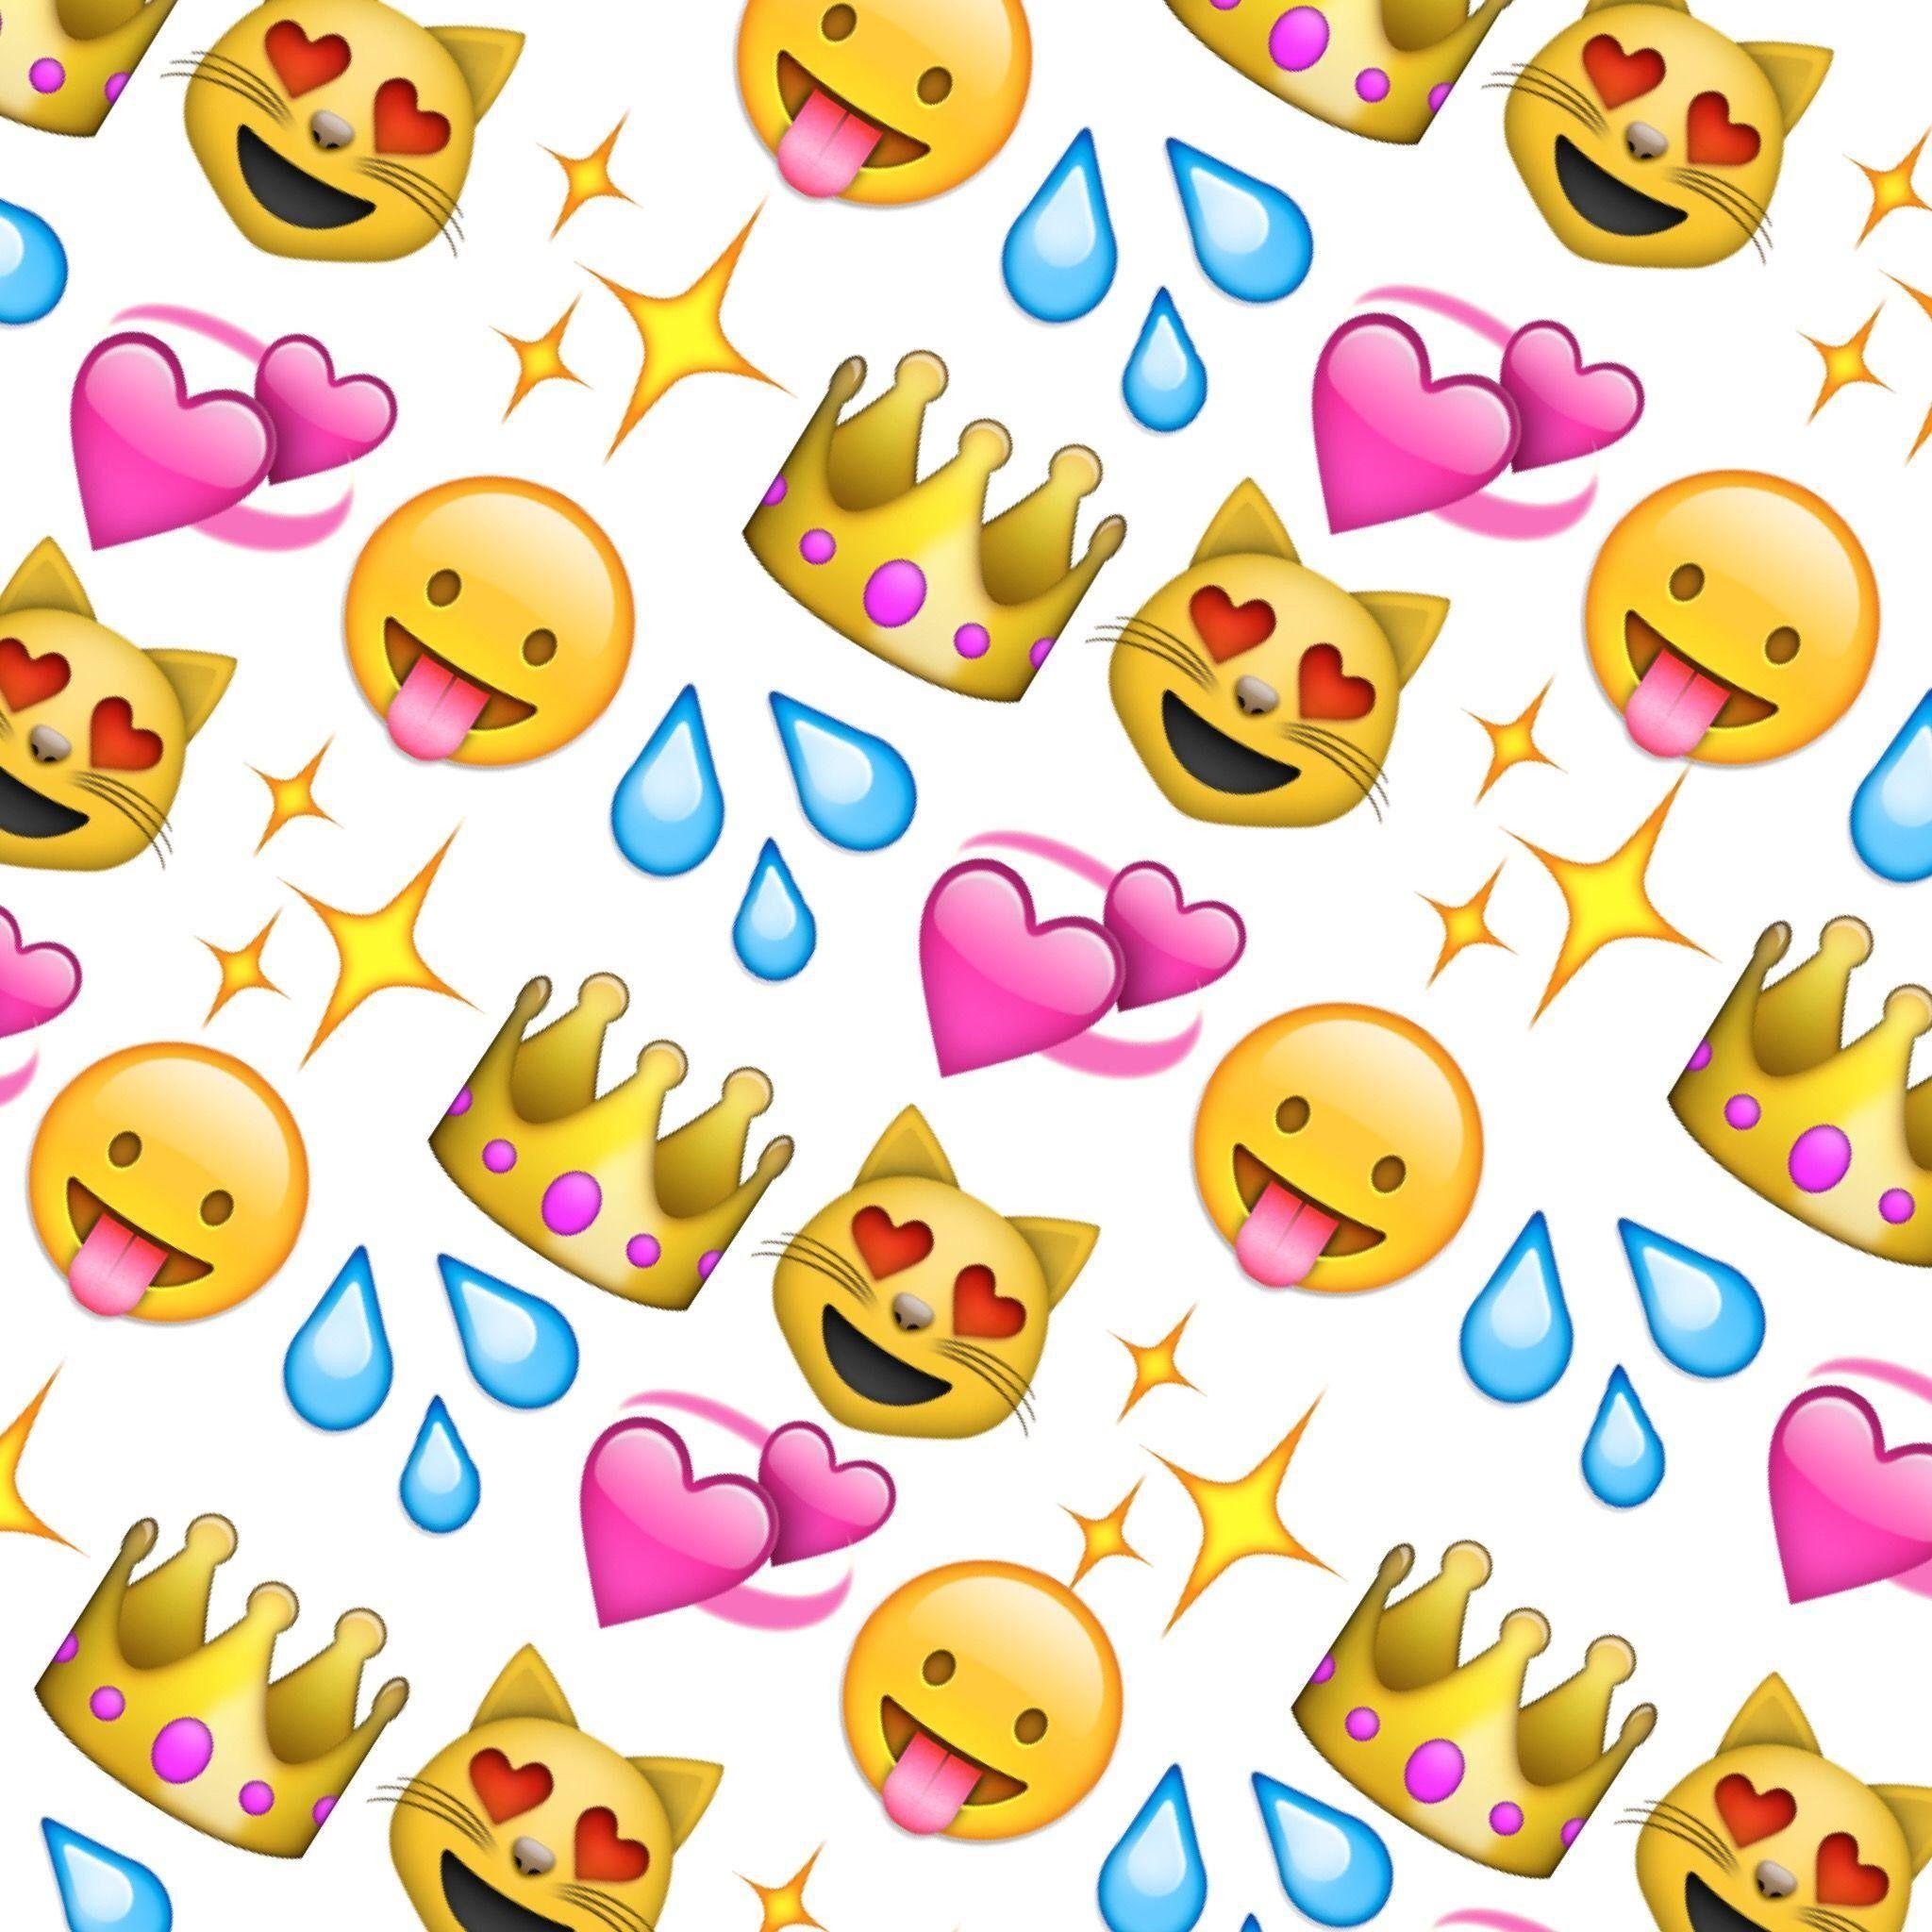 Cute Emoji Wallpapers Top Free Cute Emoji Backgrounds Wallpaperaccess